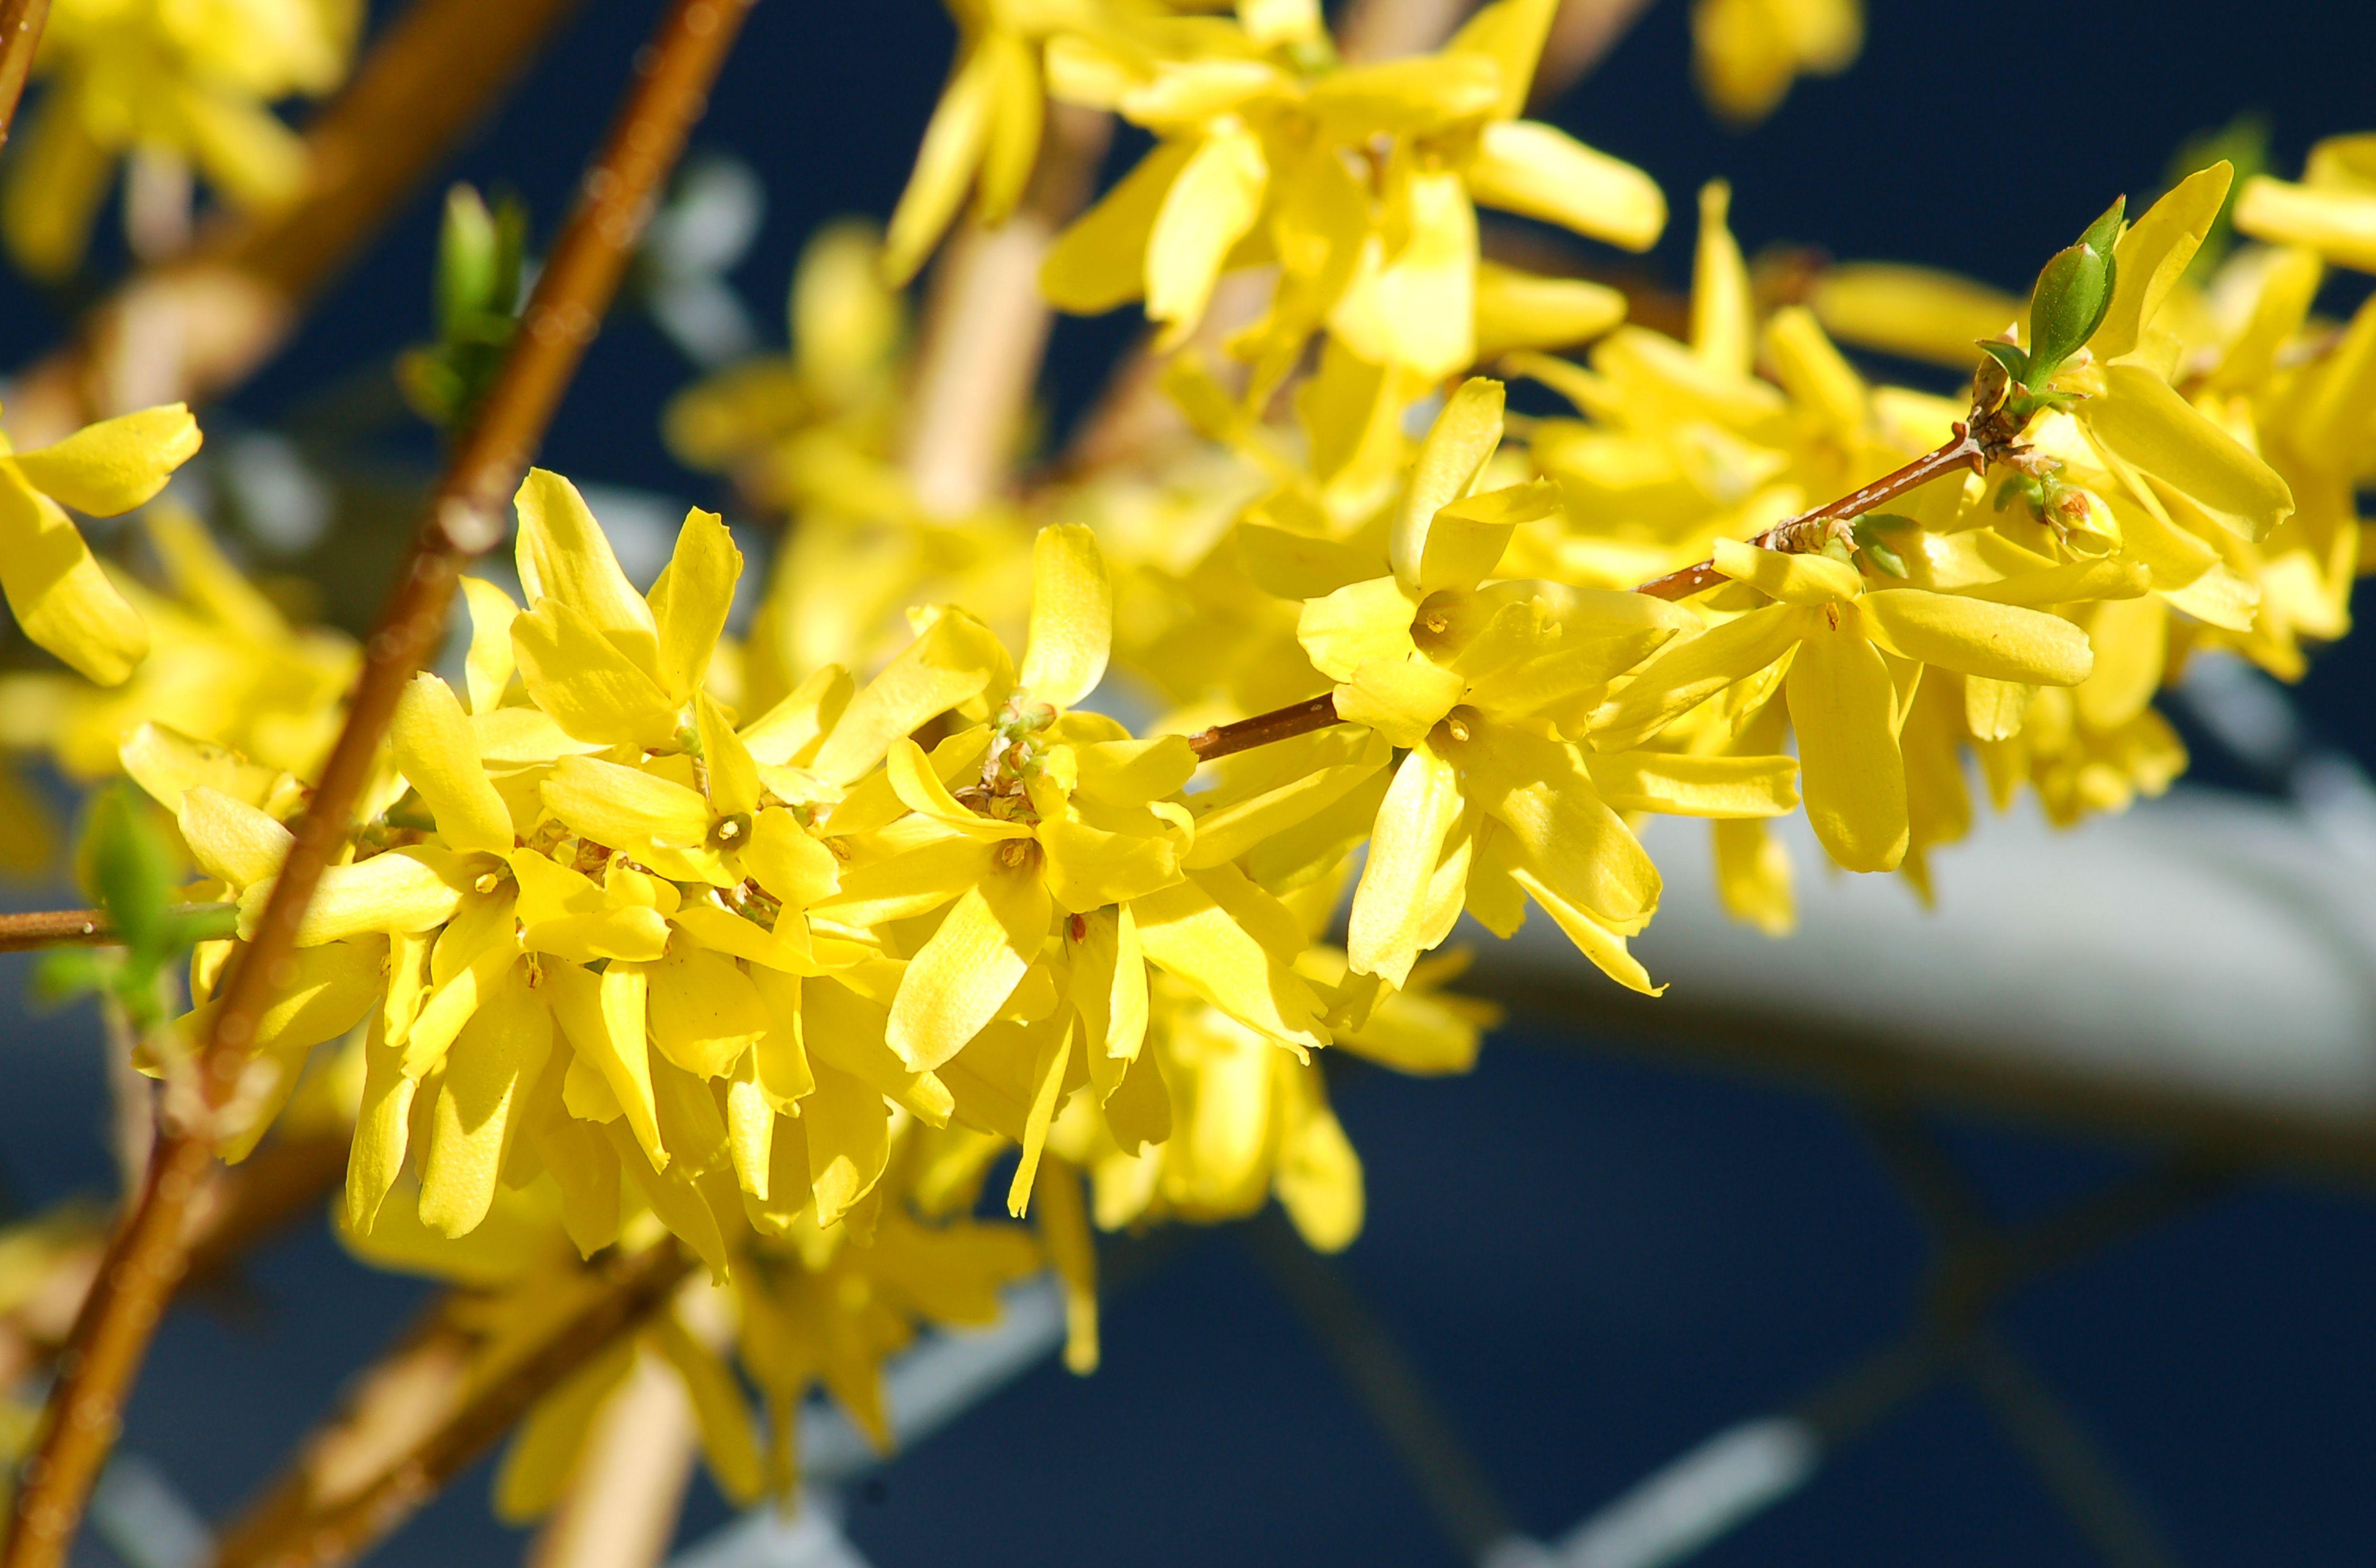 Forsythia branch in bloom.